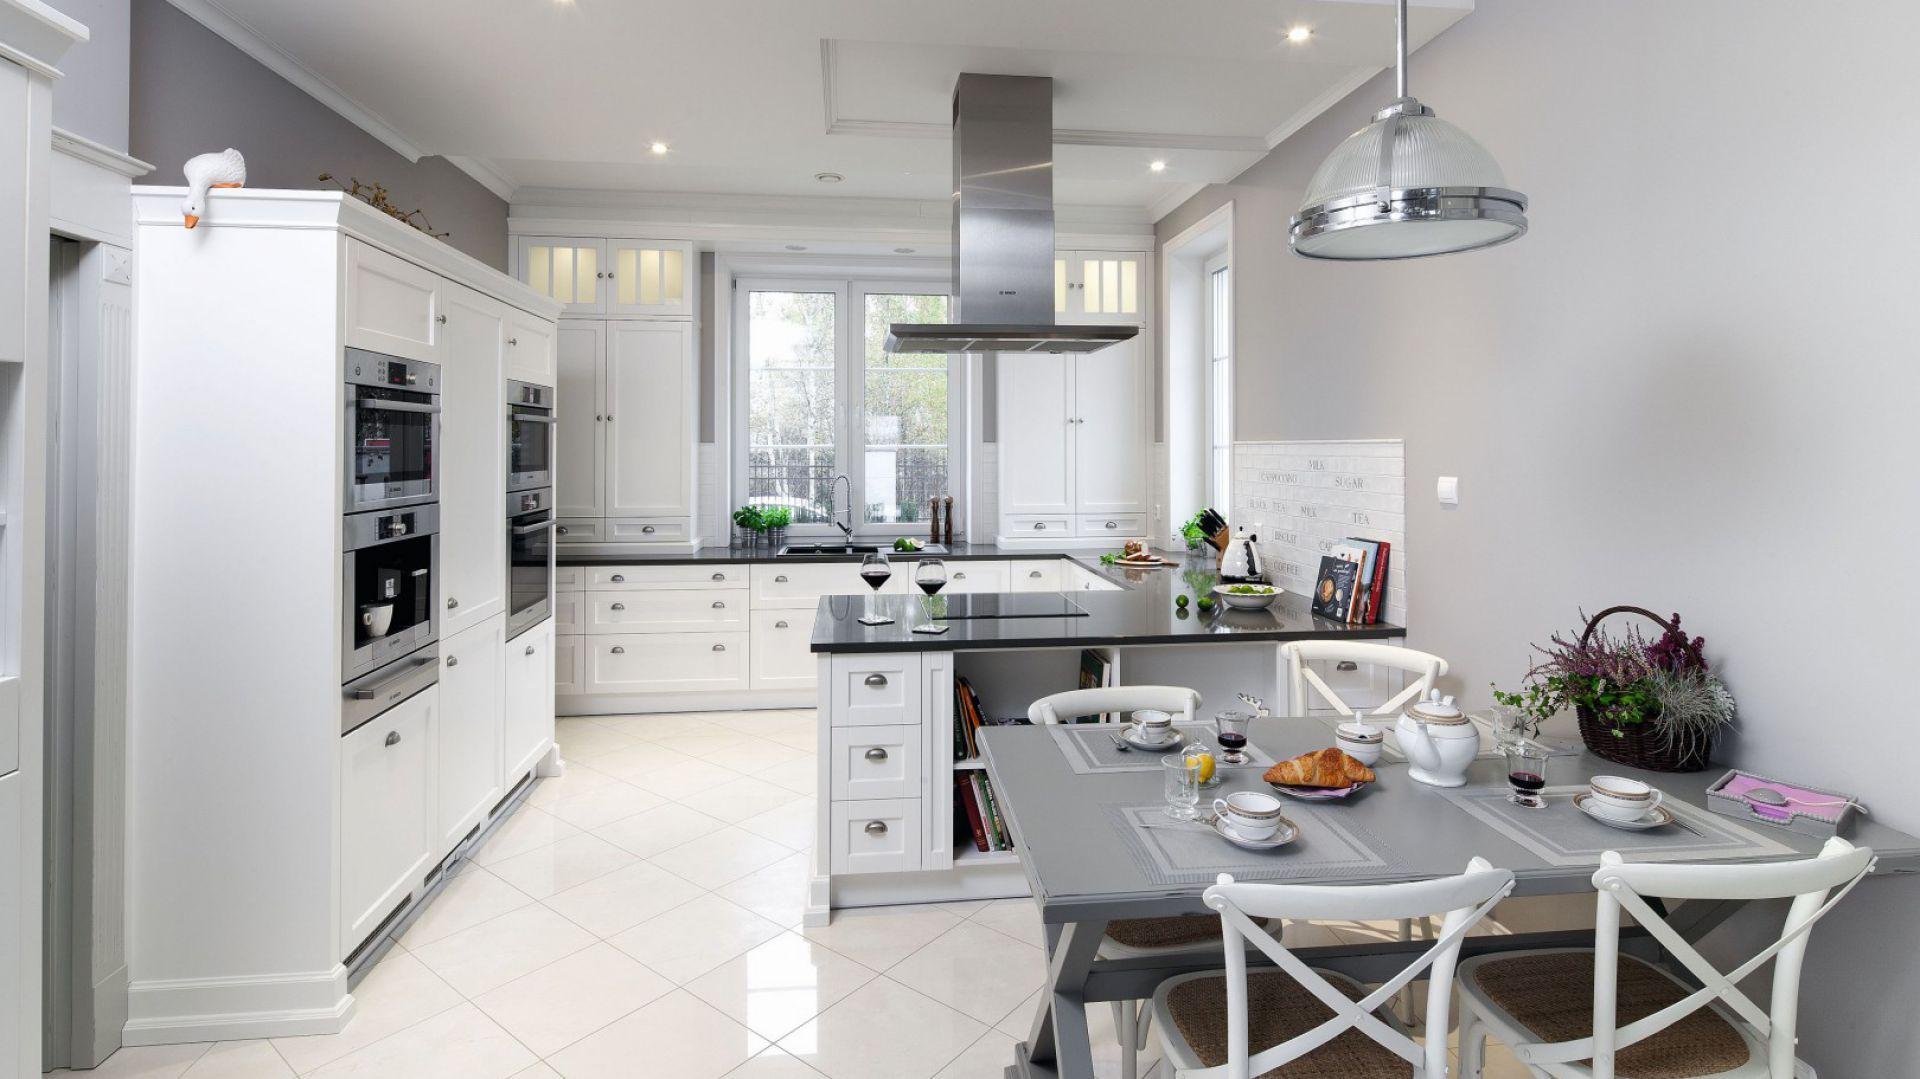 Polwysep W Kuchni 12 Pieknych Zdjec White Kitchen Design Kitchen Design Closed Kitchen Design